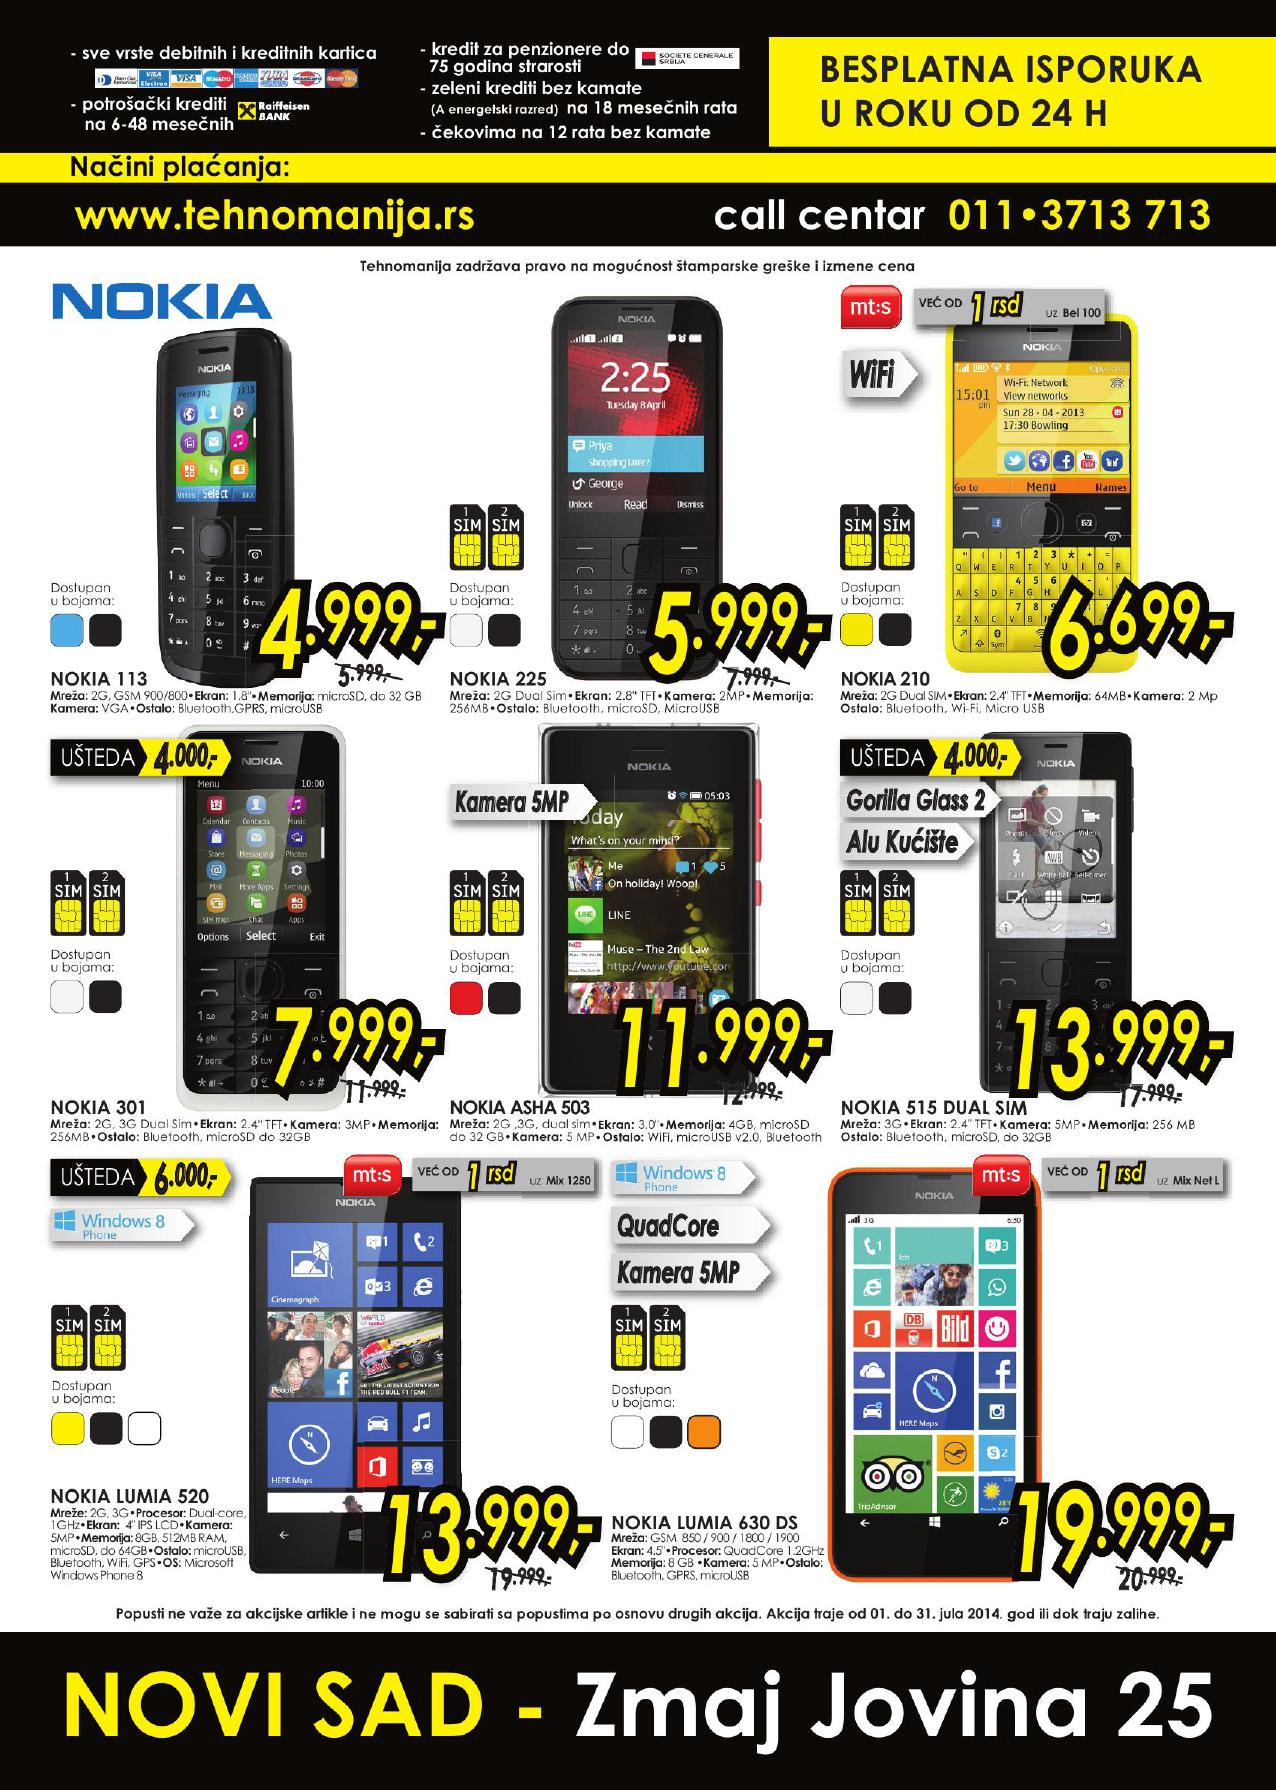 Tehnomanija akcija mobilni telefoni Vojvodina